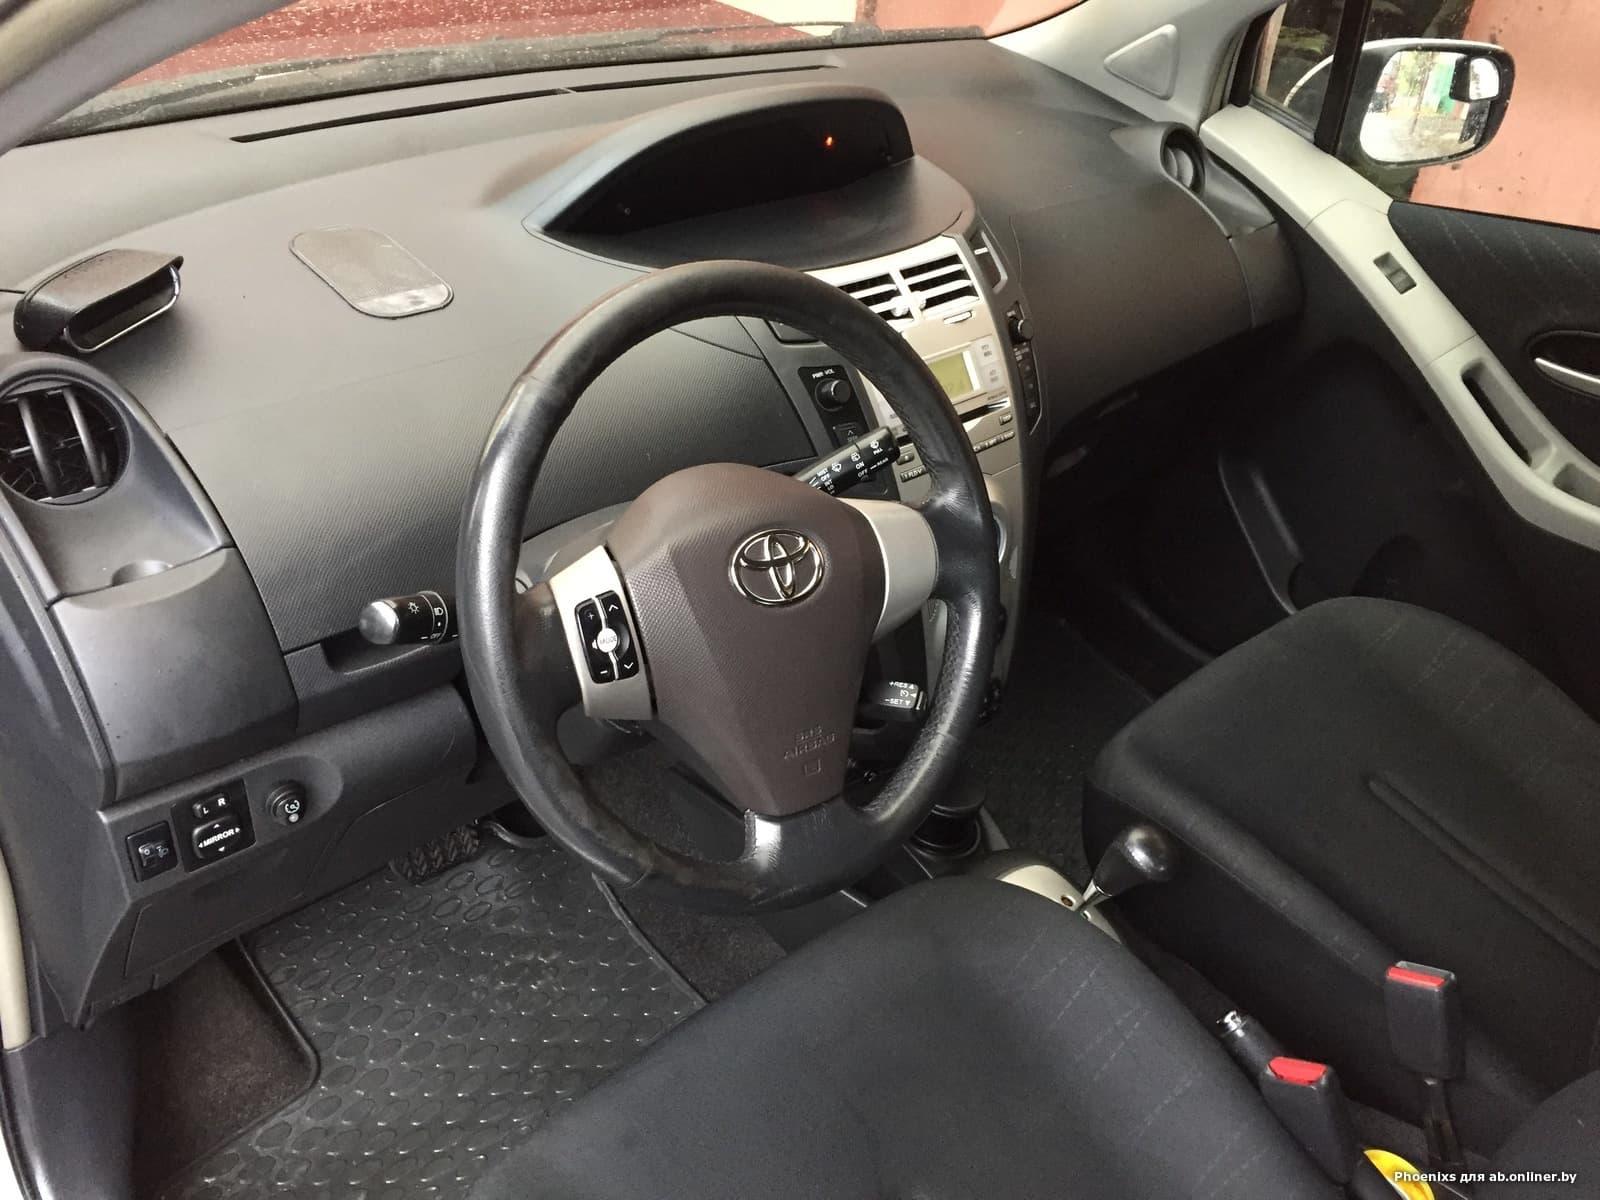 Toyota Yaris D4-D